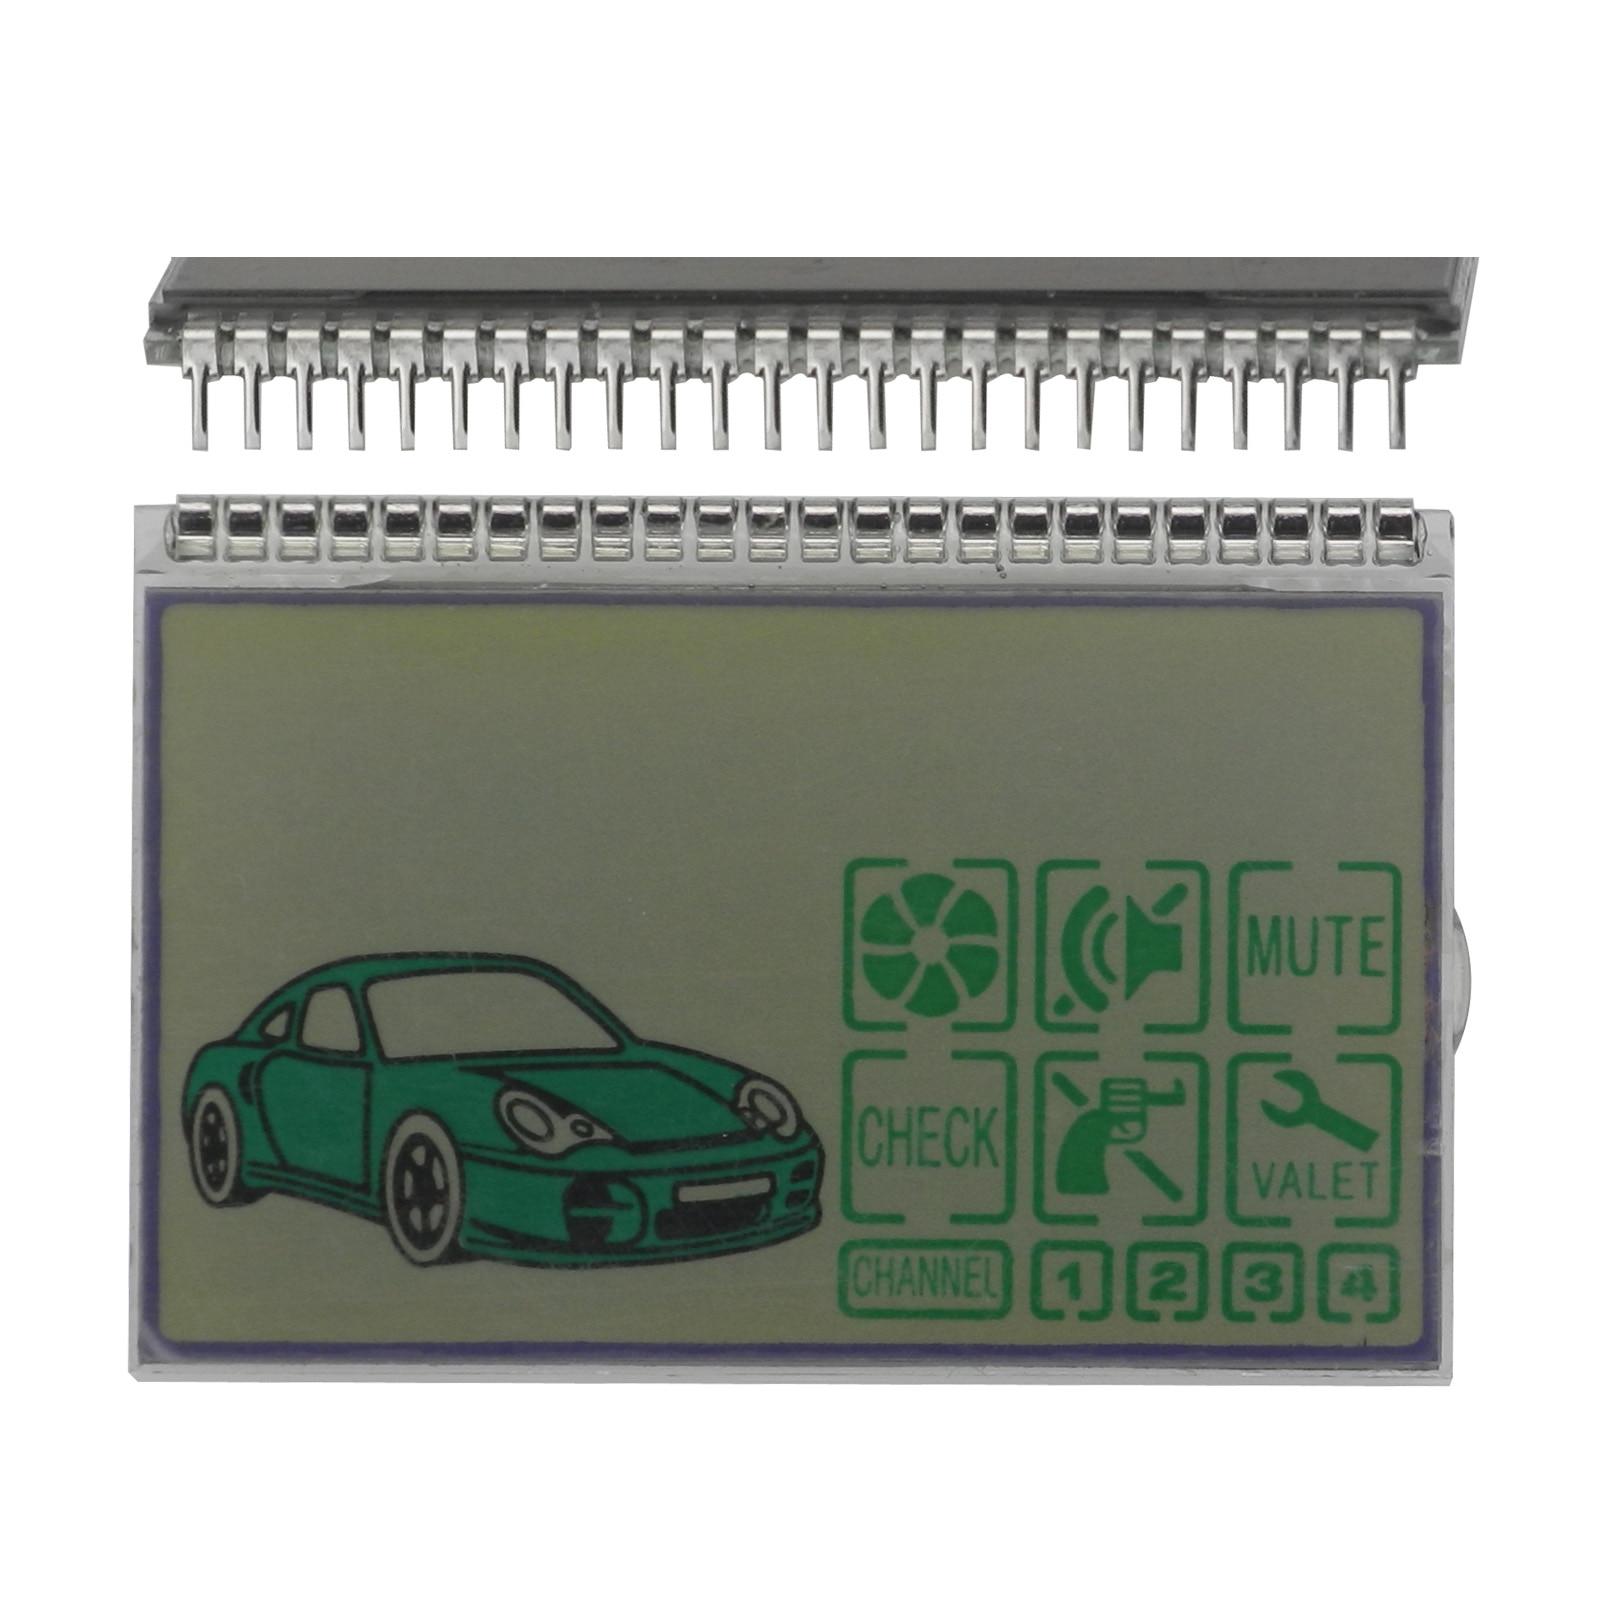 jingyuqin for Pandora DXL3000 LCD Remote Controller Car Key Chain /Two way Car Alarm System DXL 3000 LCD Display Tamarack FOB